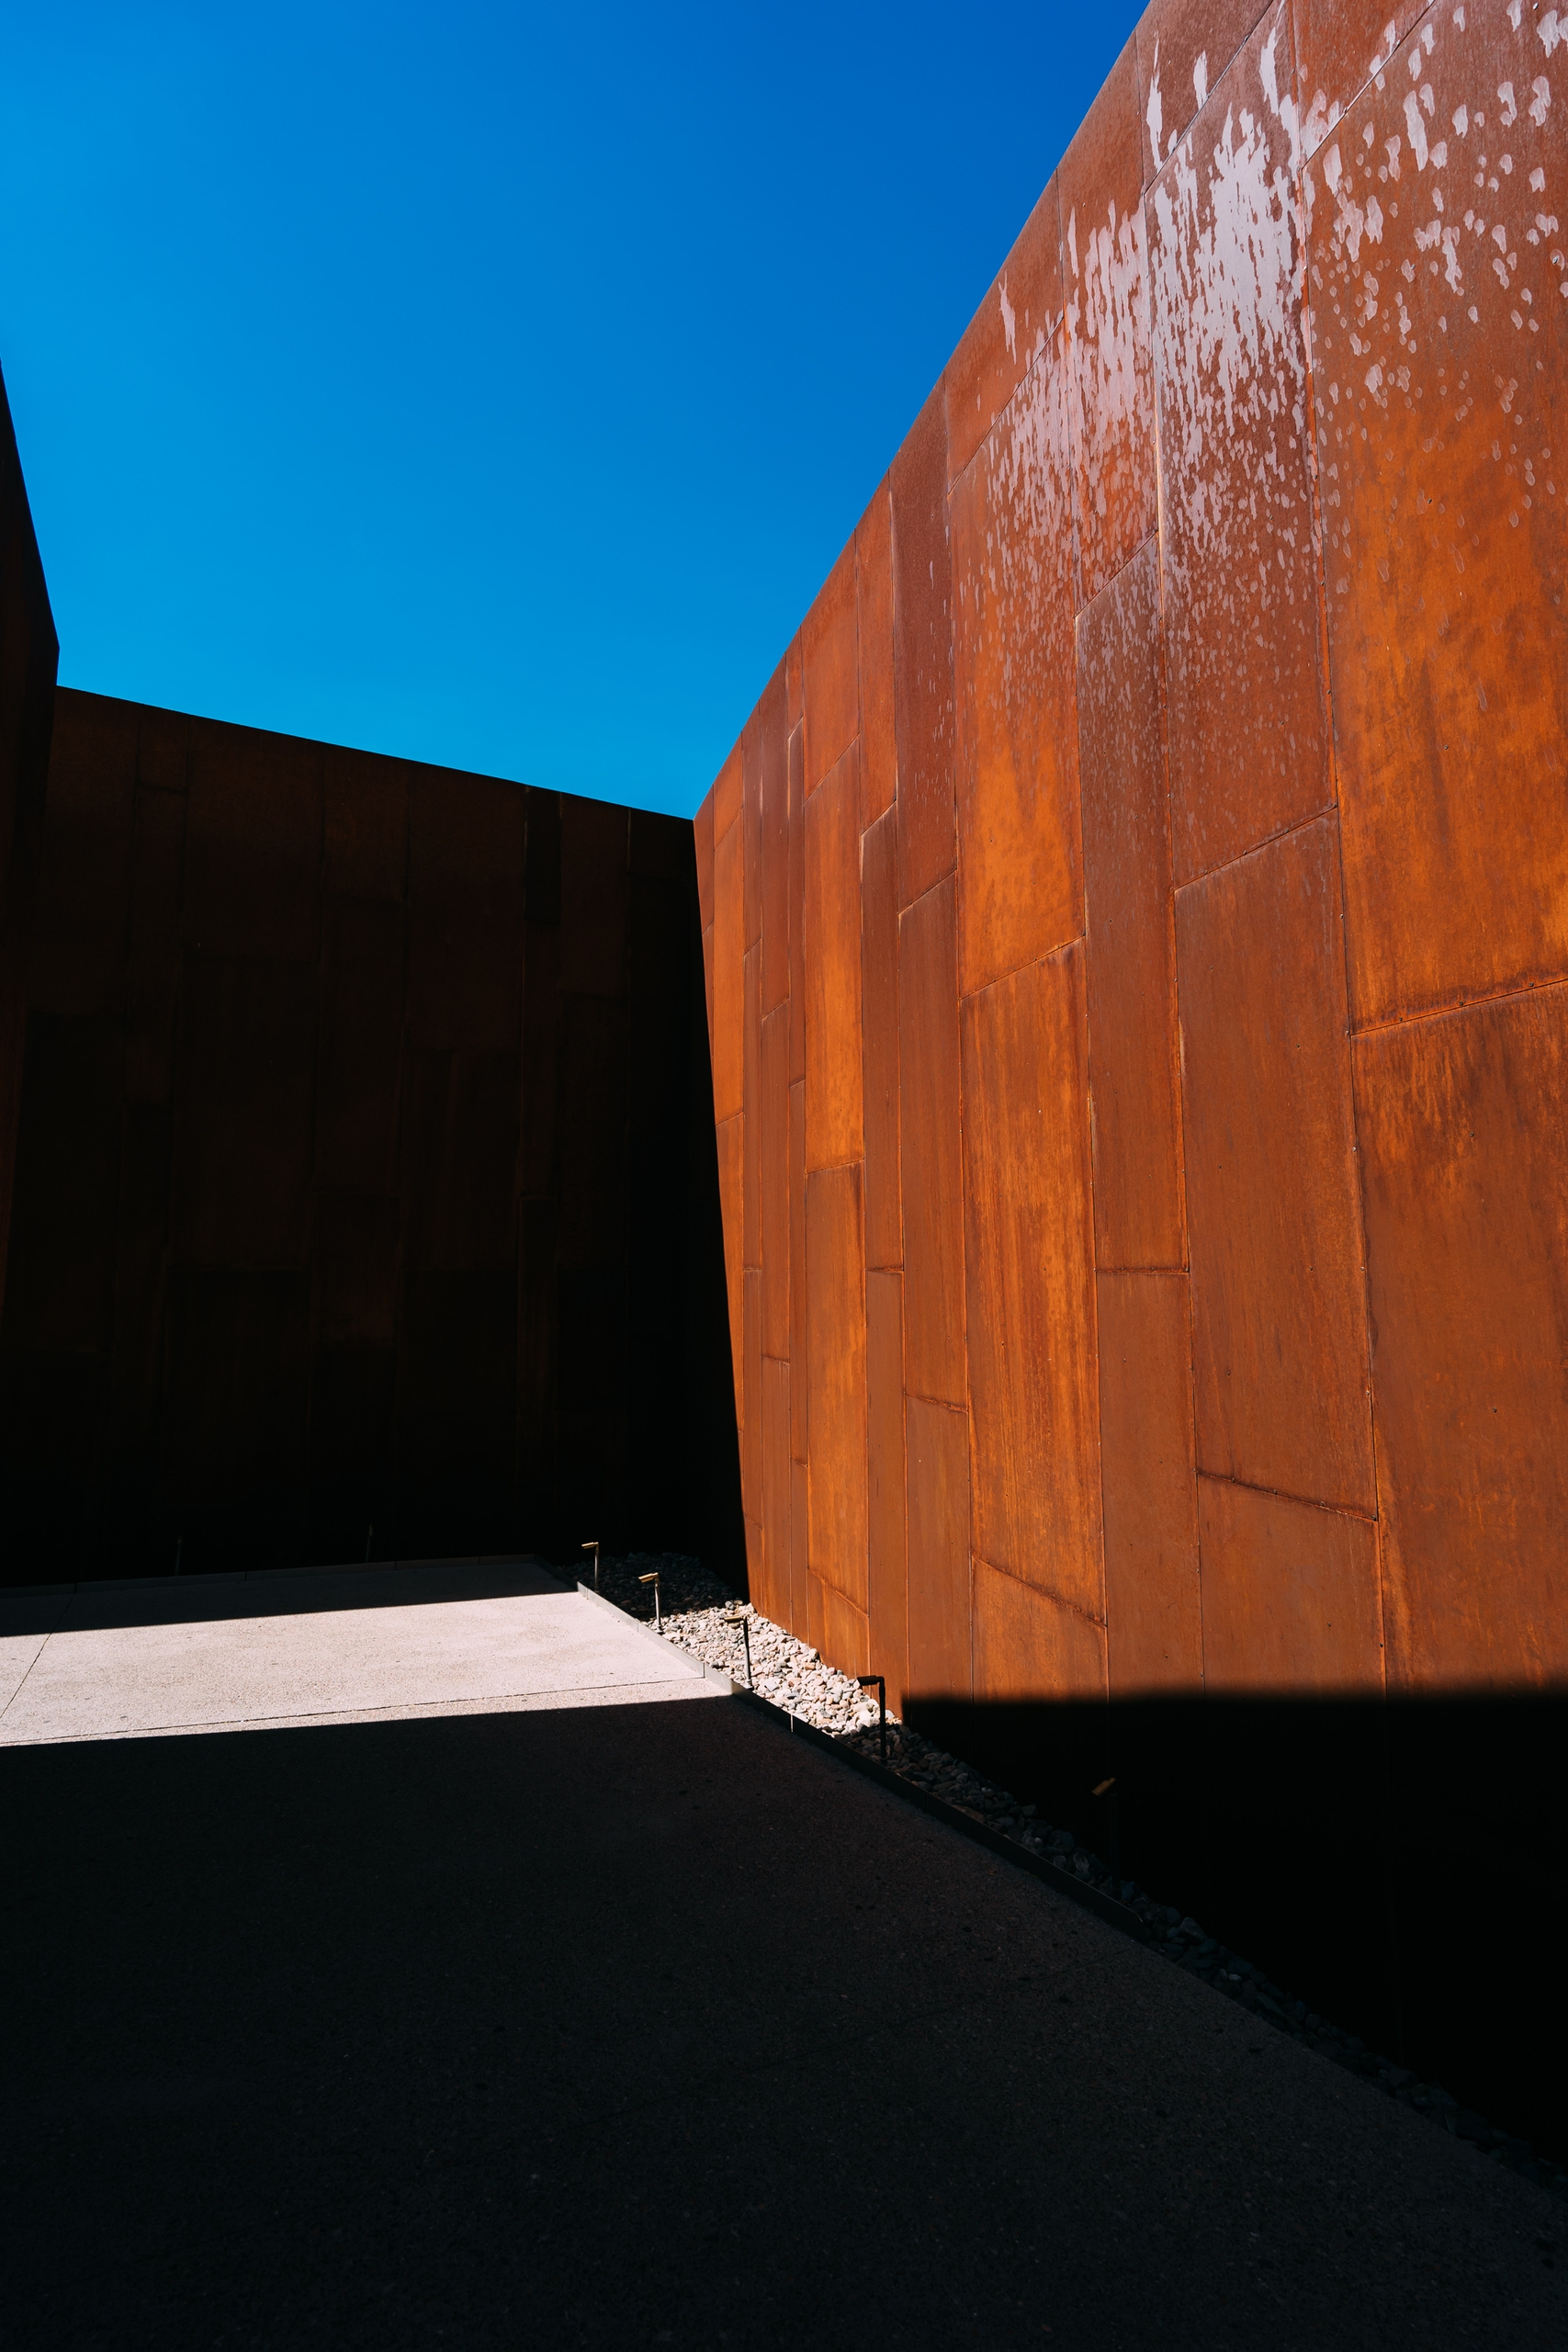 Arabian Library, Scottsdale Ari - nickstanley | ello